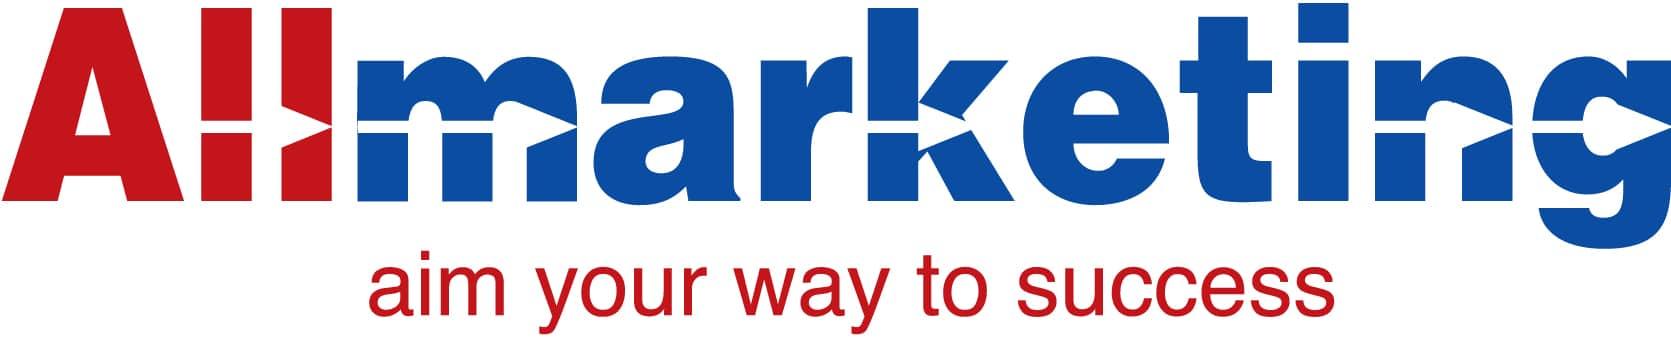 AllMarketing logo